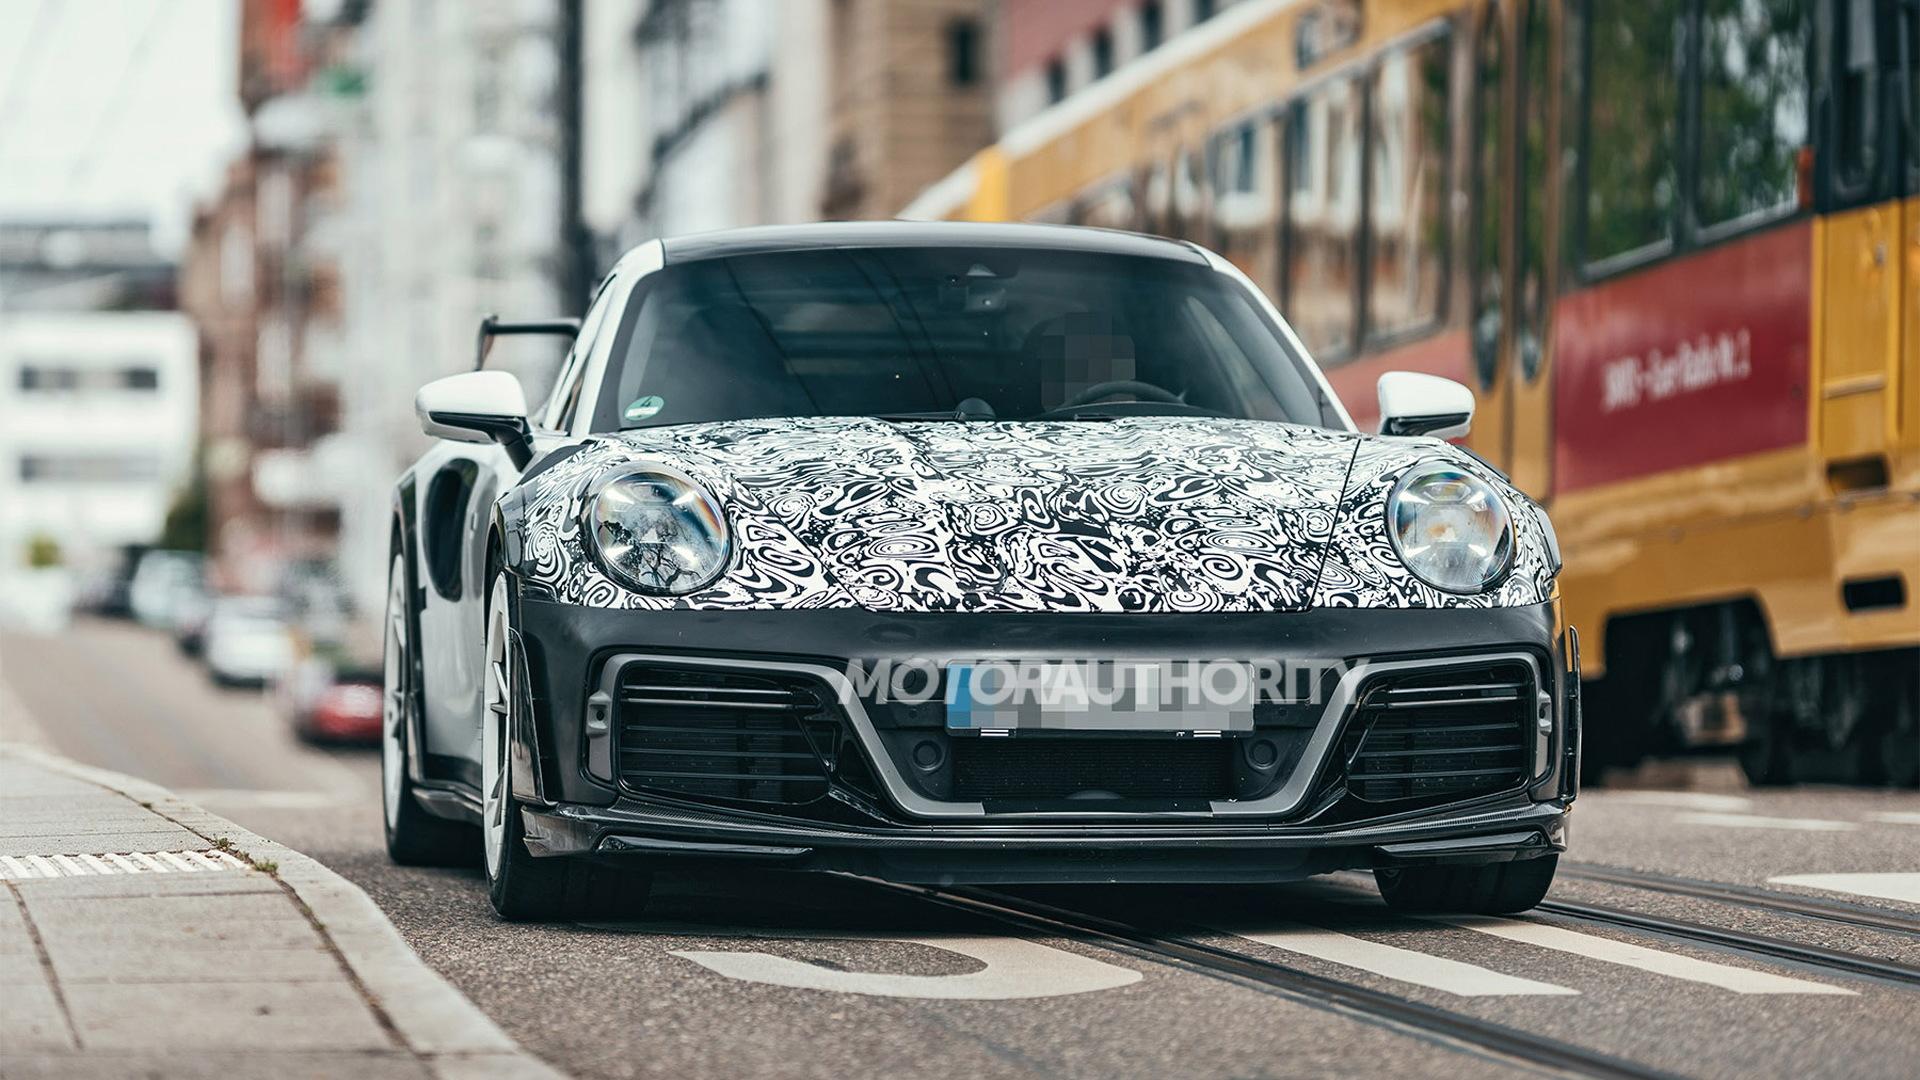 2021 Techart GT Street R spy shots - Photo credit:S. Baldauf/SB-Medien